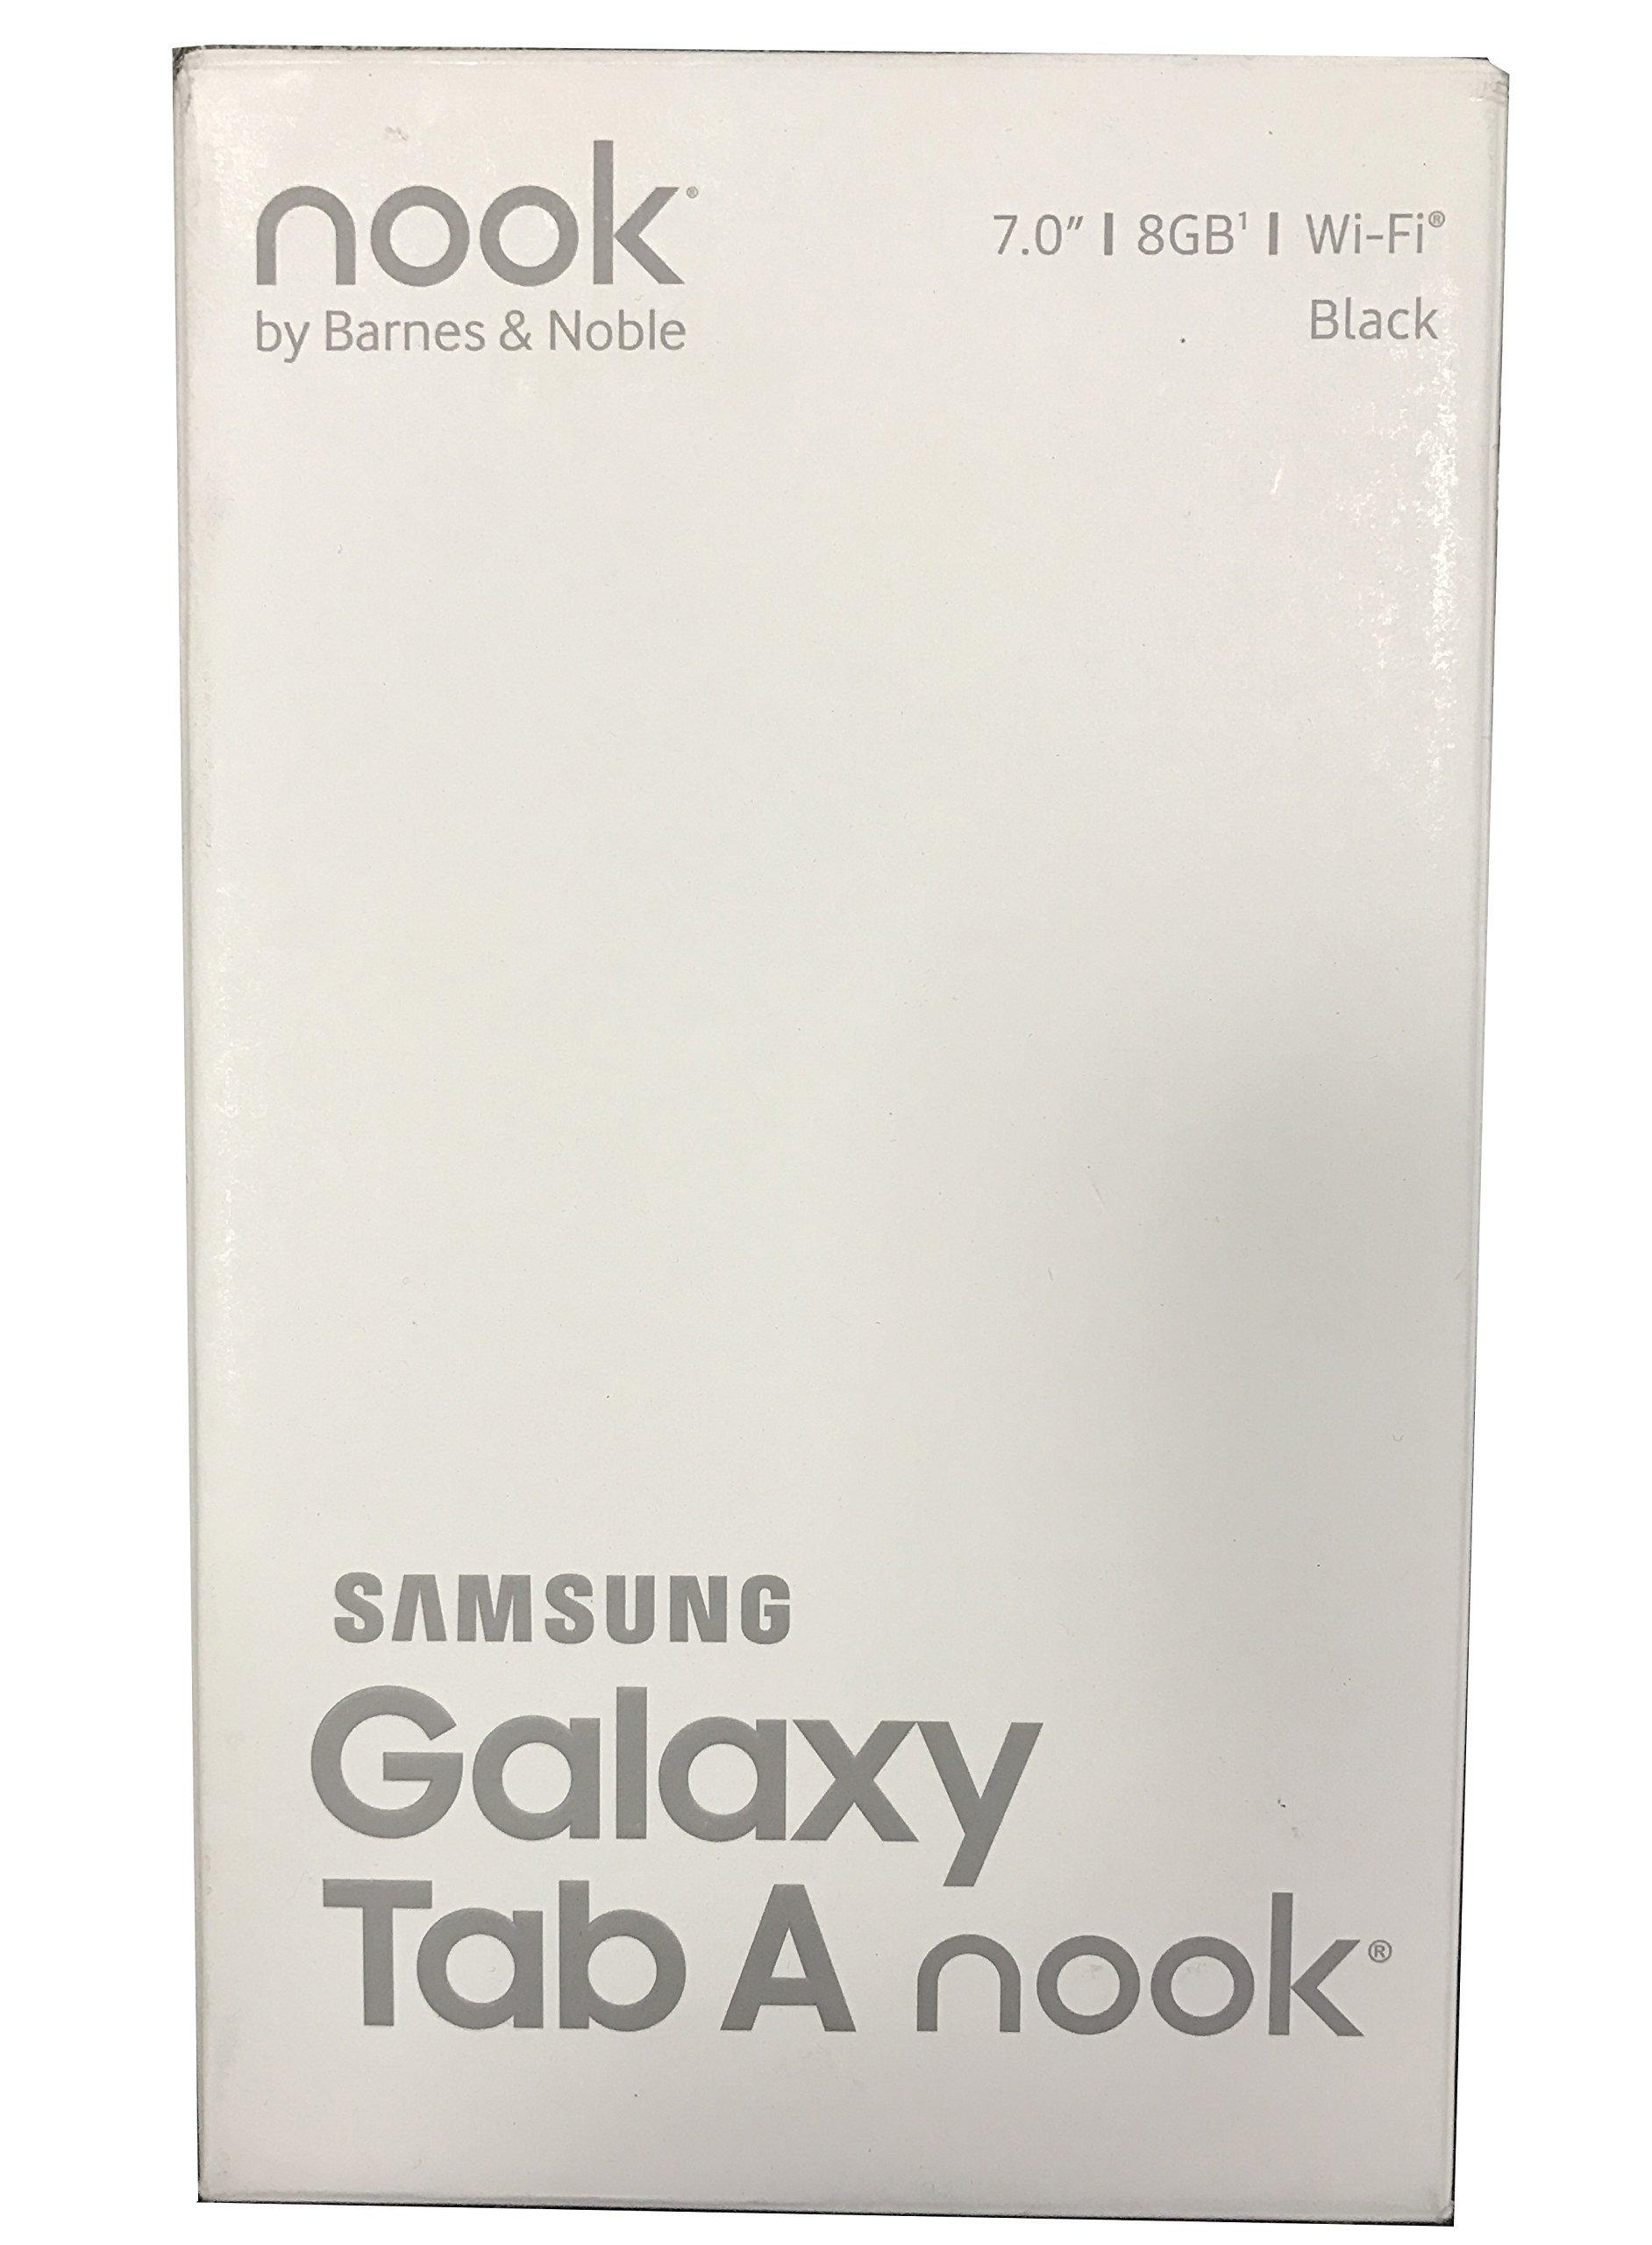 Samsung Galaxy Tab A NOOK 7'' Tablet Black (SM-T280-NOOK) (Certified Refurbished)